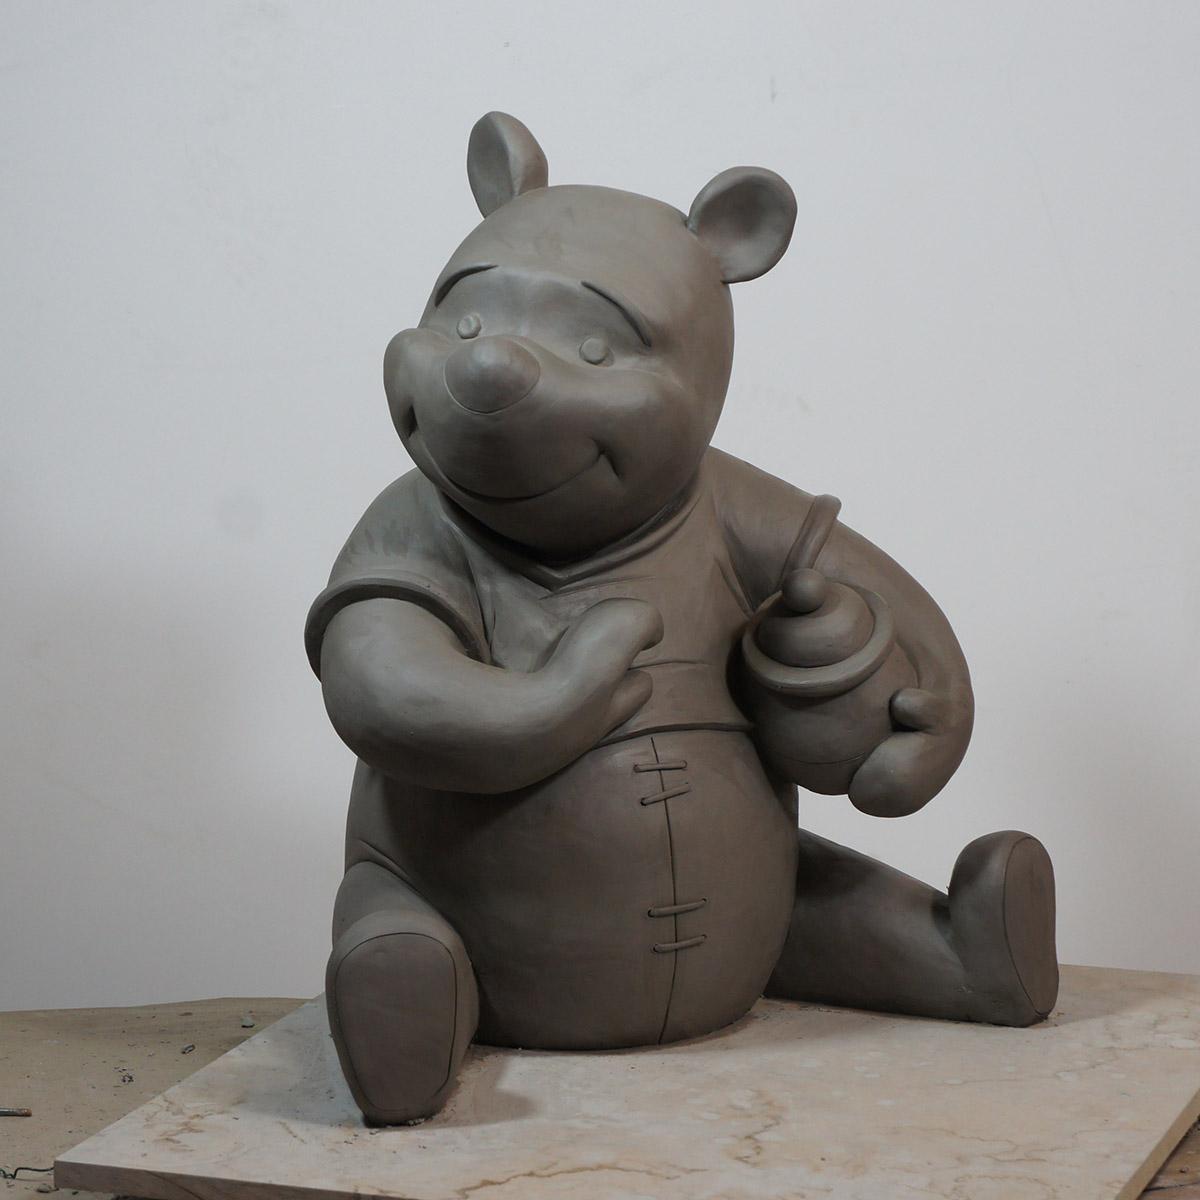 Plastelene maquette of winnie the pooh